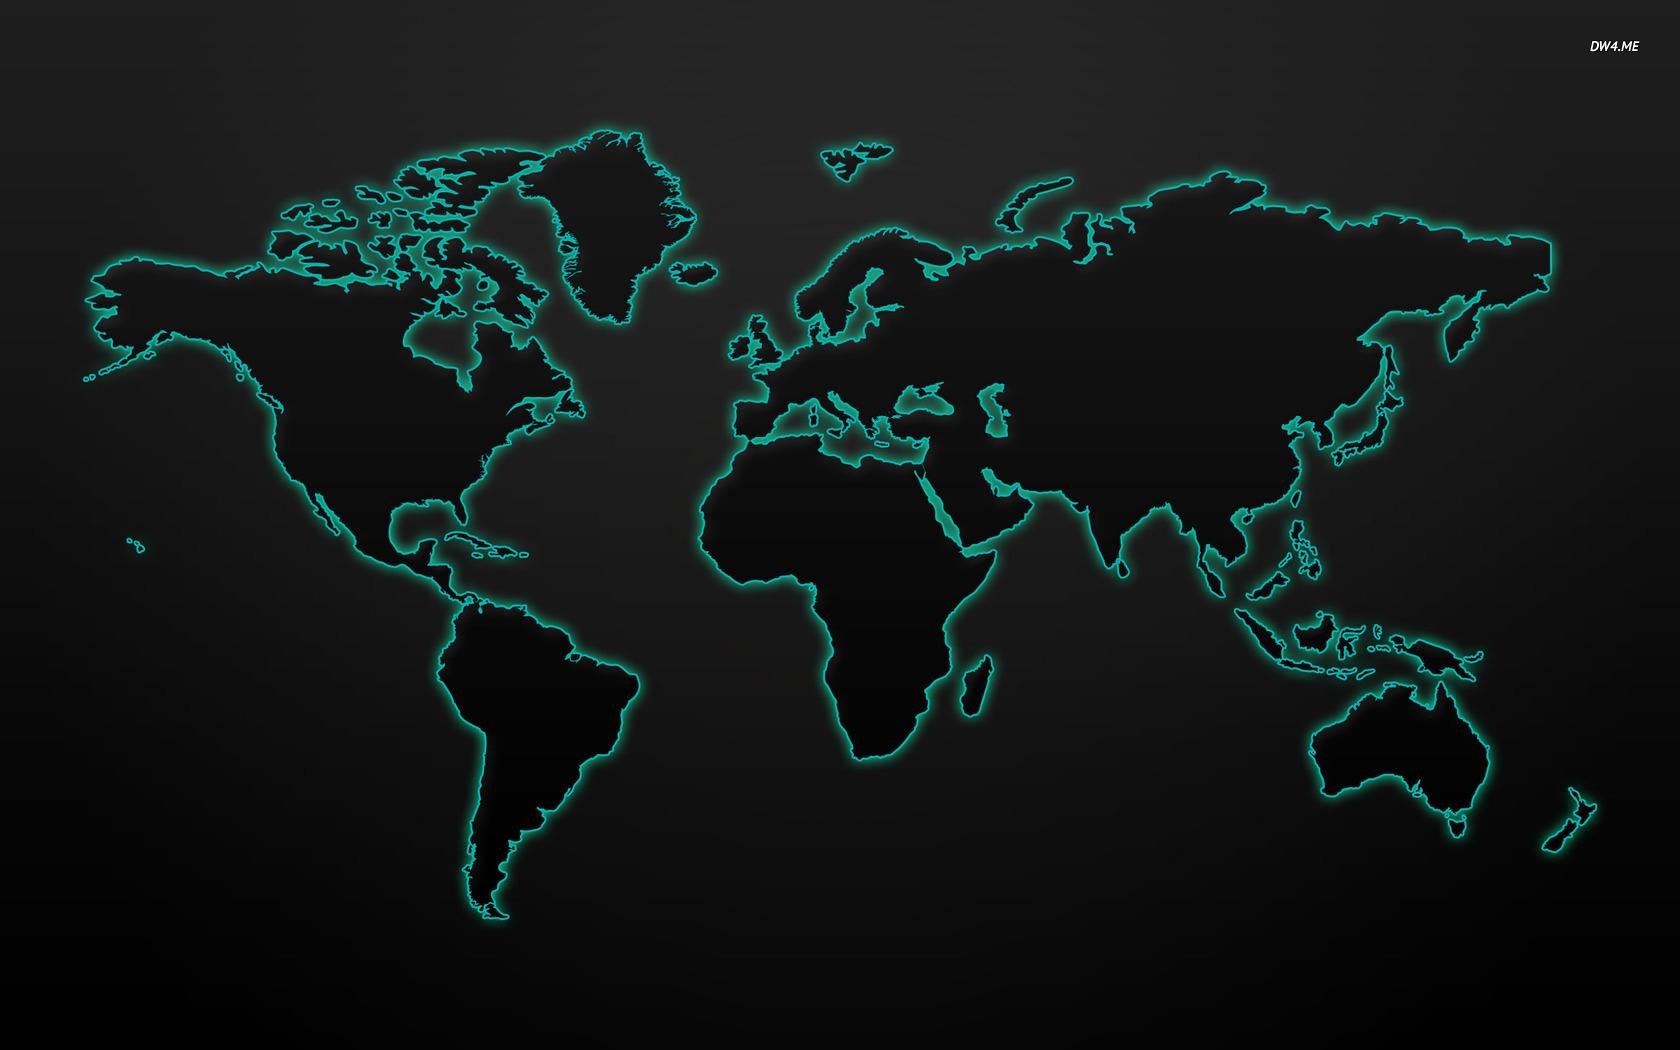 Glowing world map wallpaper   Digital Art wallpapers   322 1680x1050